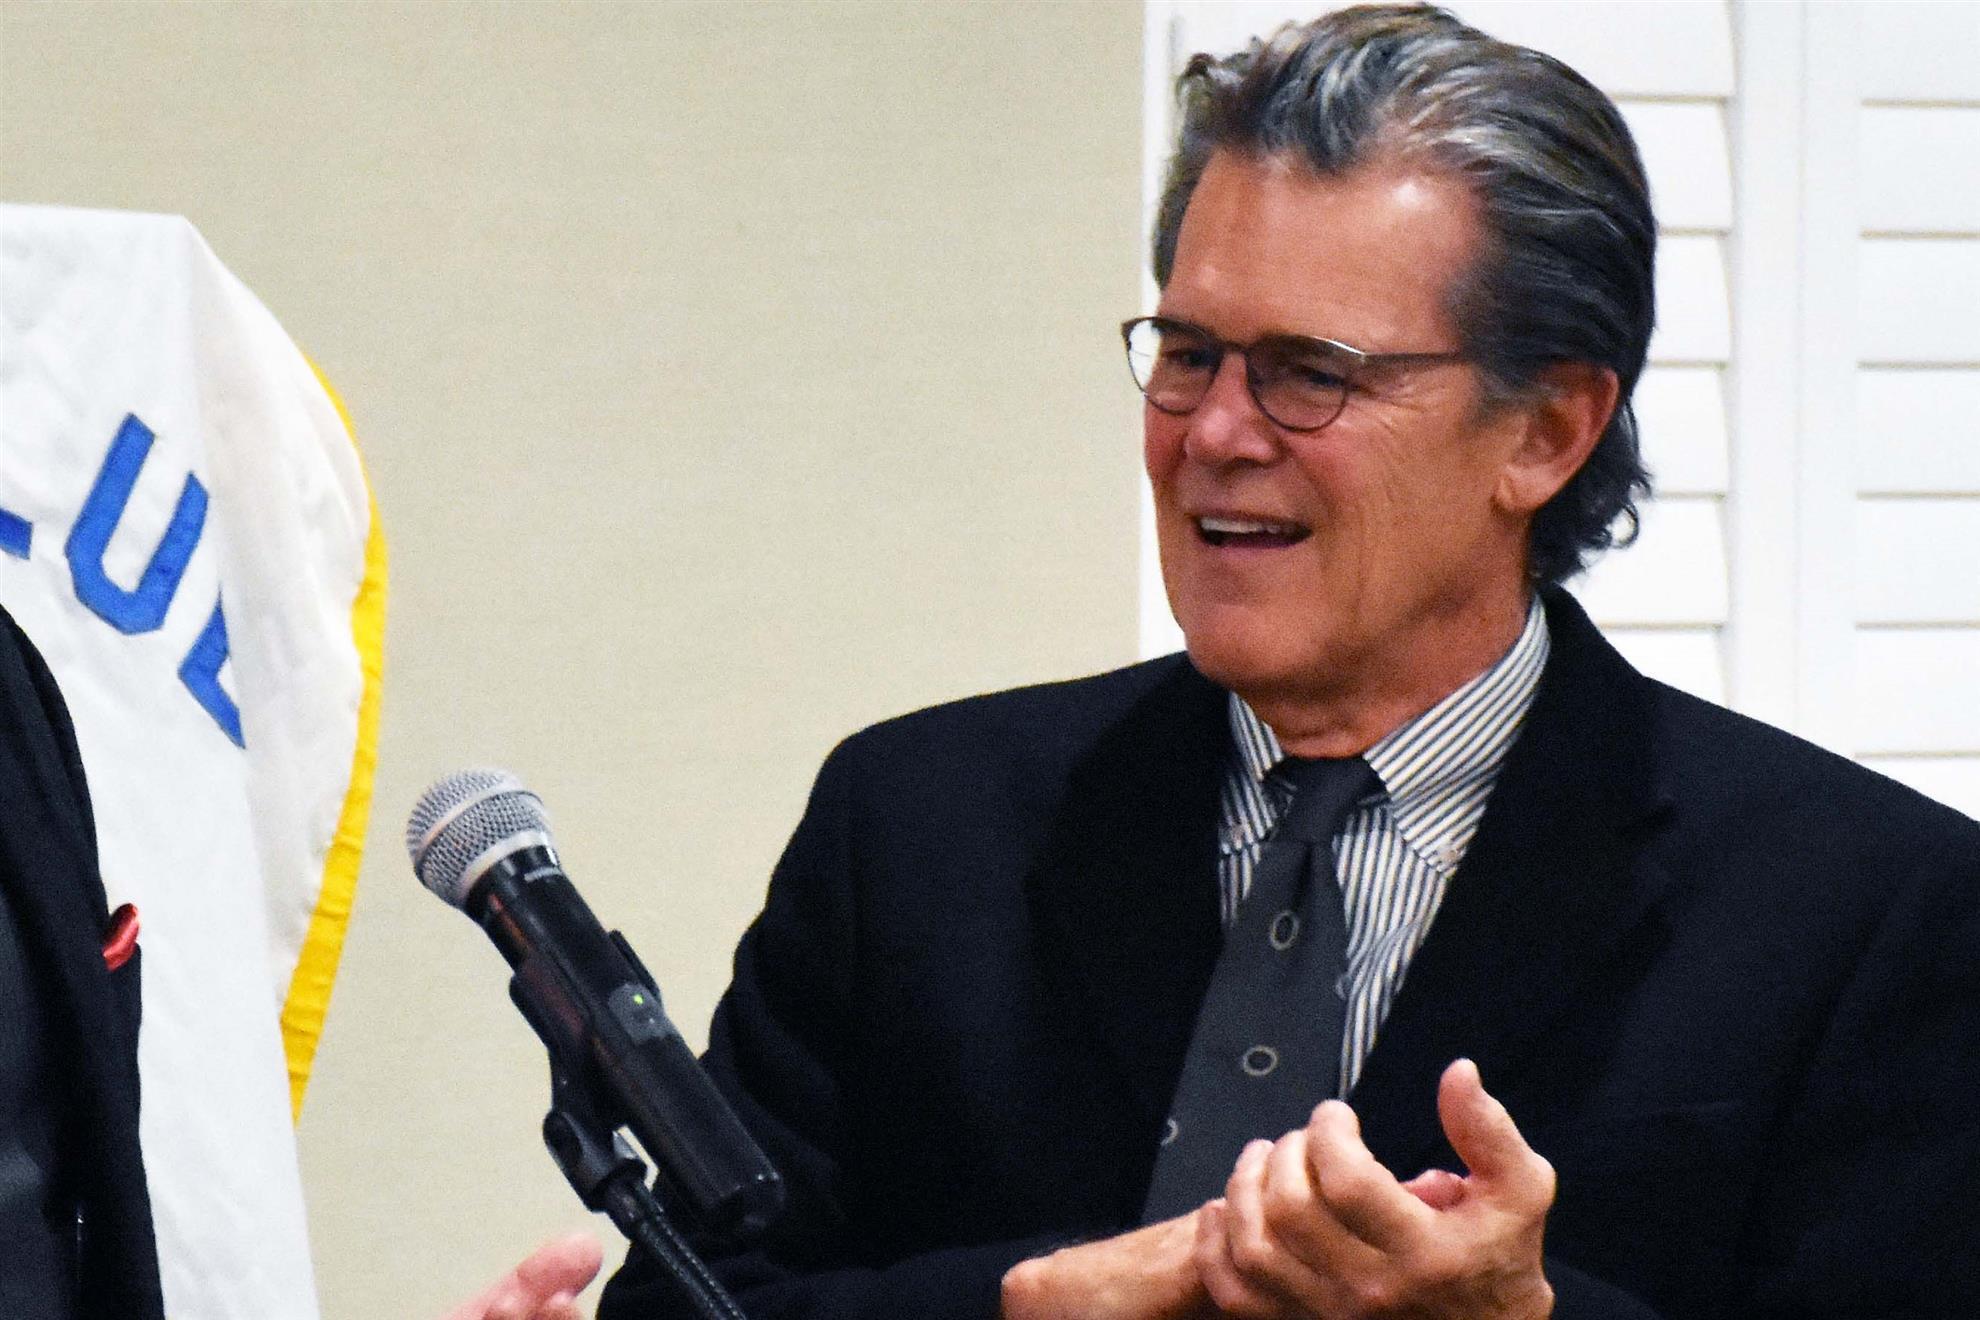 2019 Rotarian: Bruce Wentworth